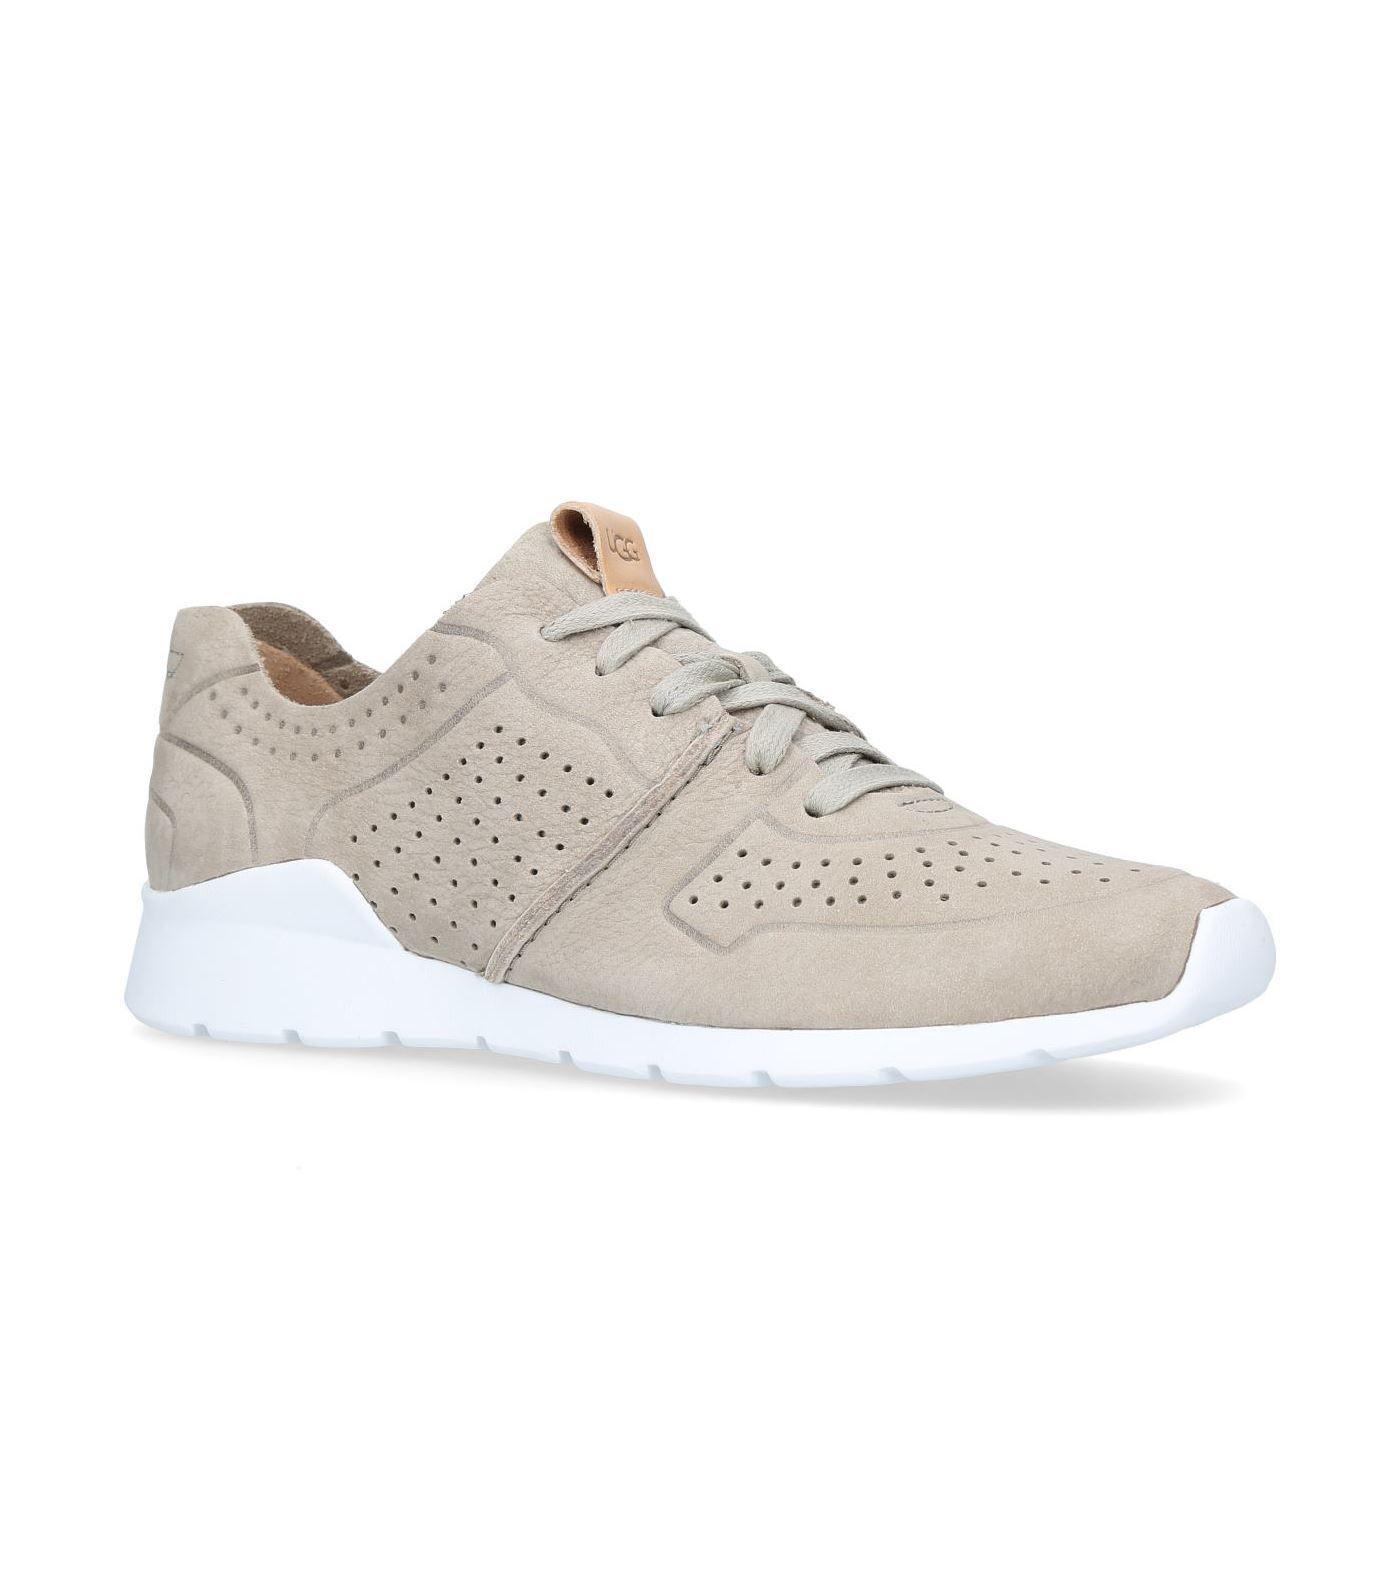 For Nice Sneaker TYE nubuck Hole pattern grey UGG Recommend Sale Online nAyBnUjek